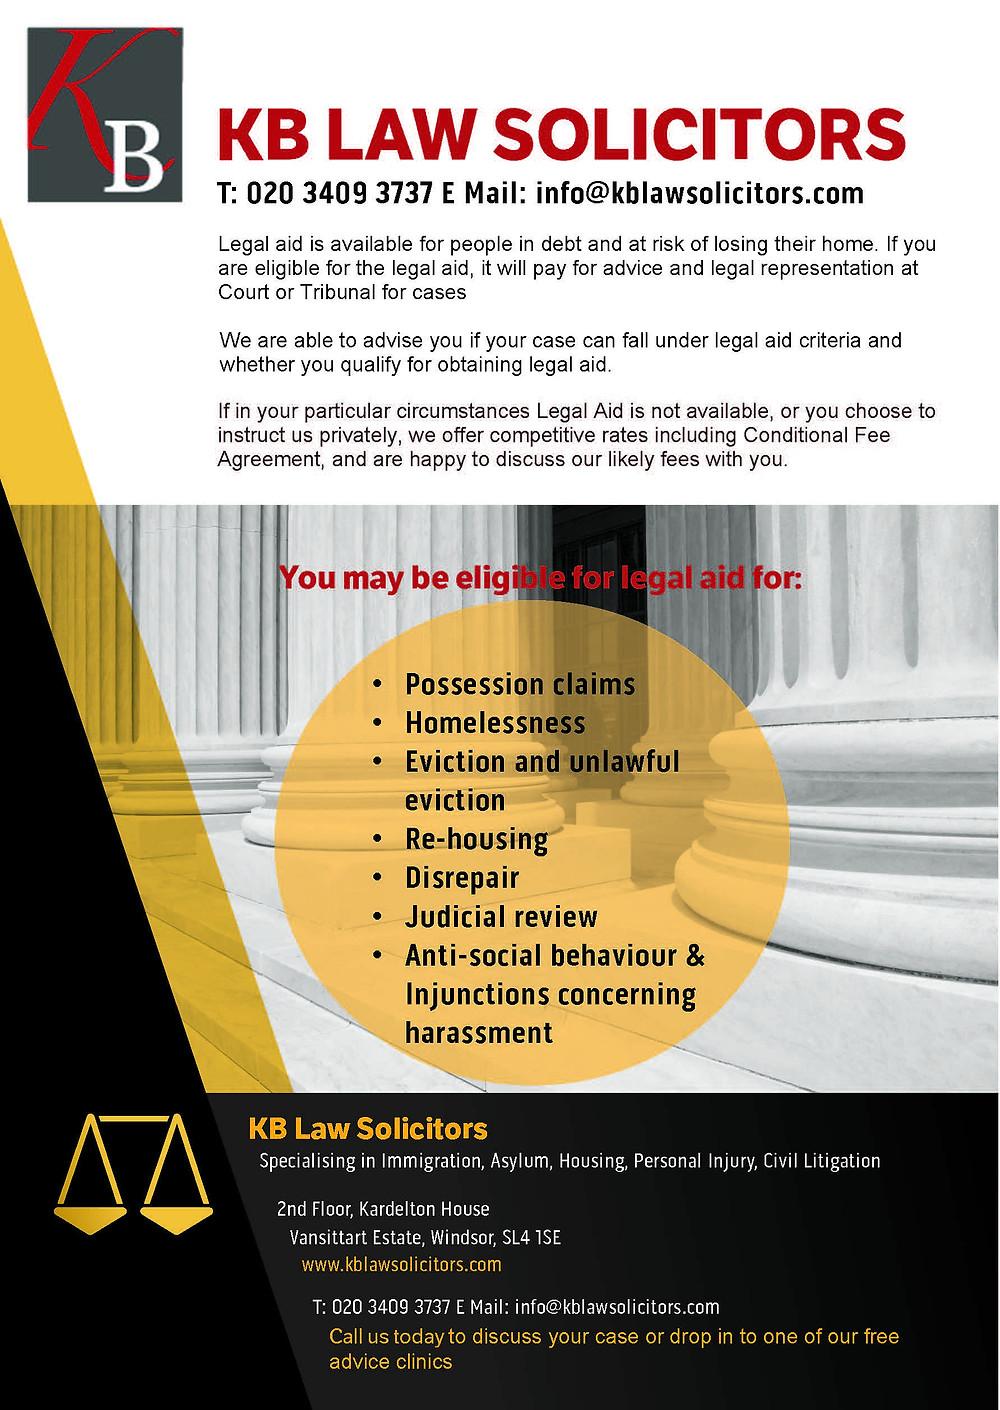 KB Law Housing - Legal aid